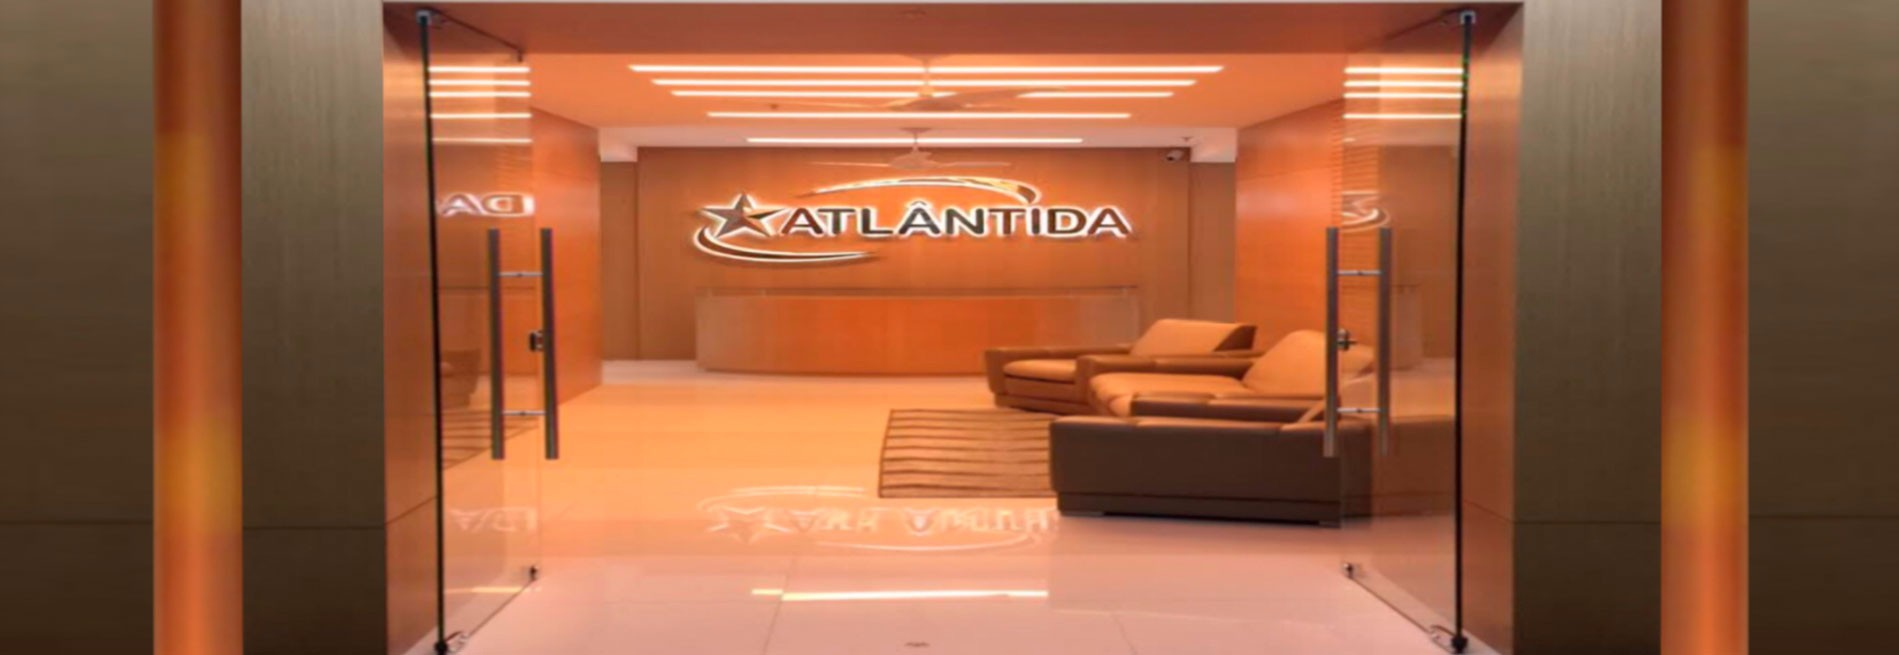 Atlantida_Administradora-1